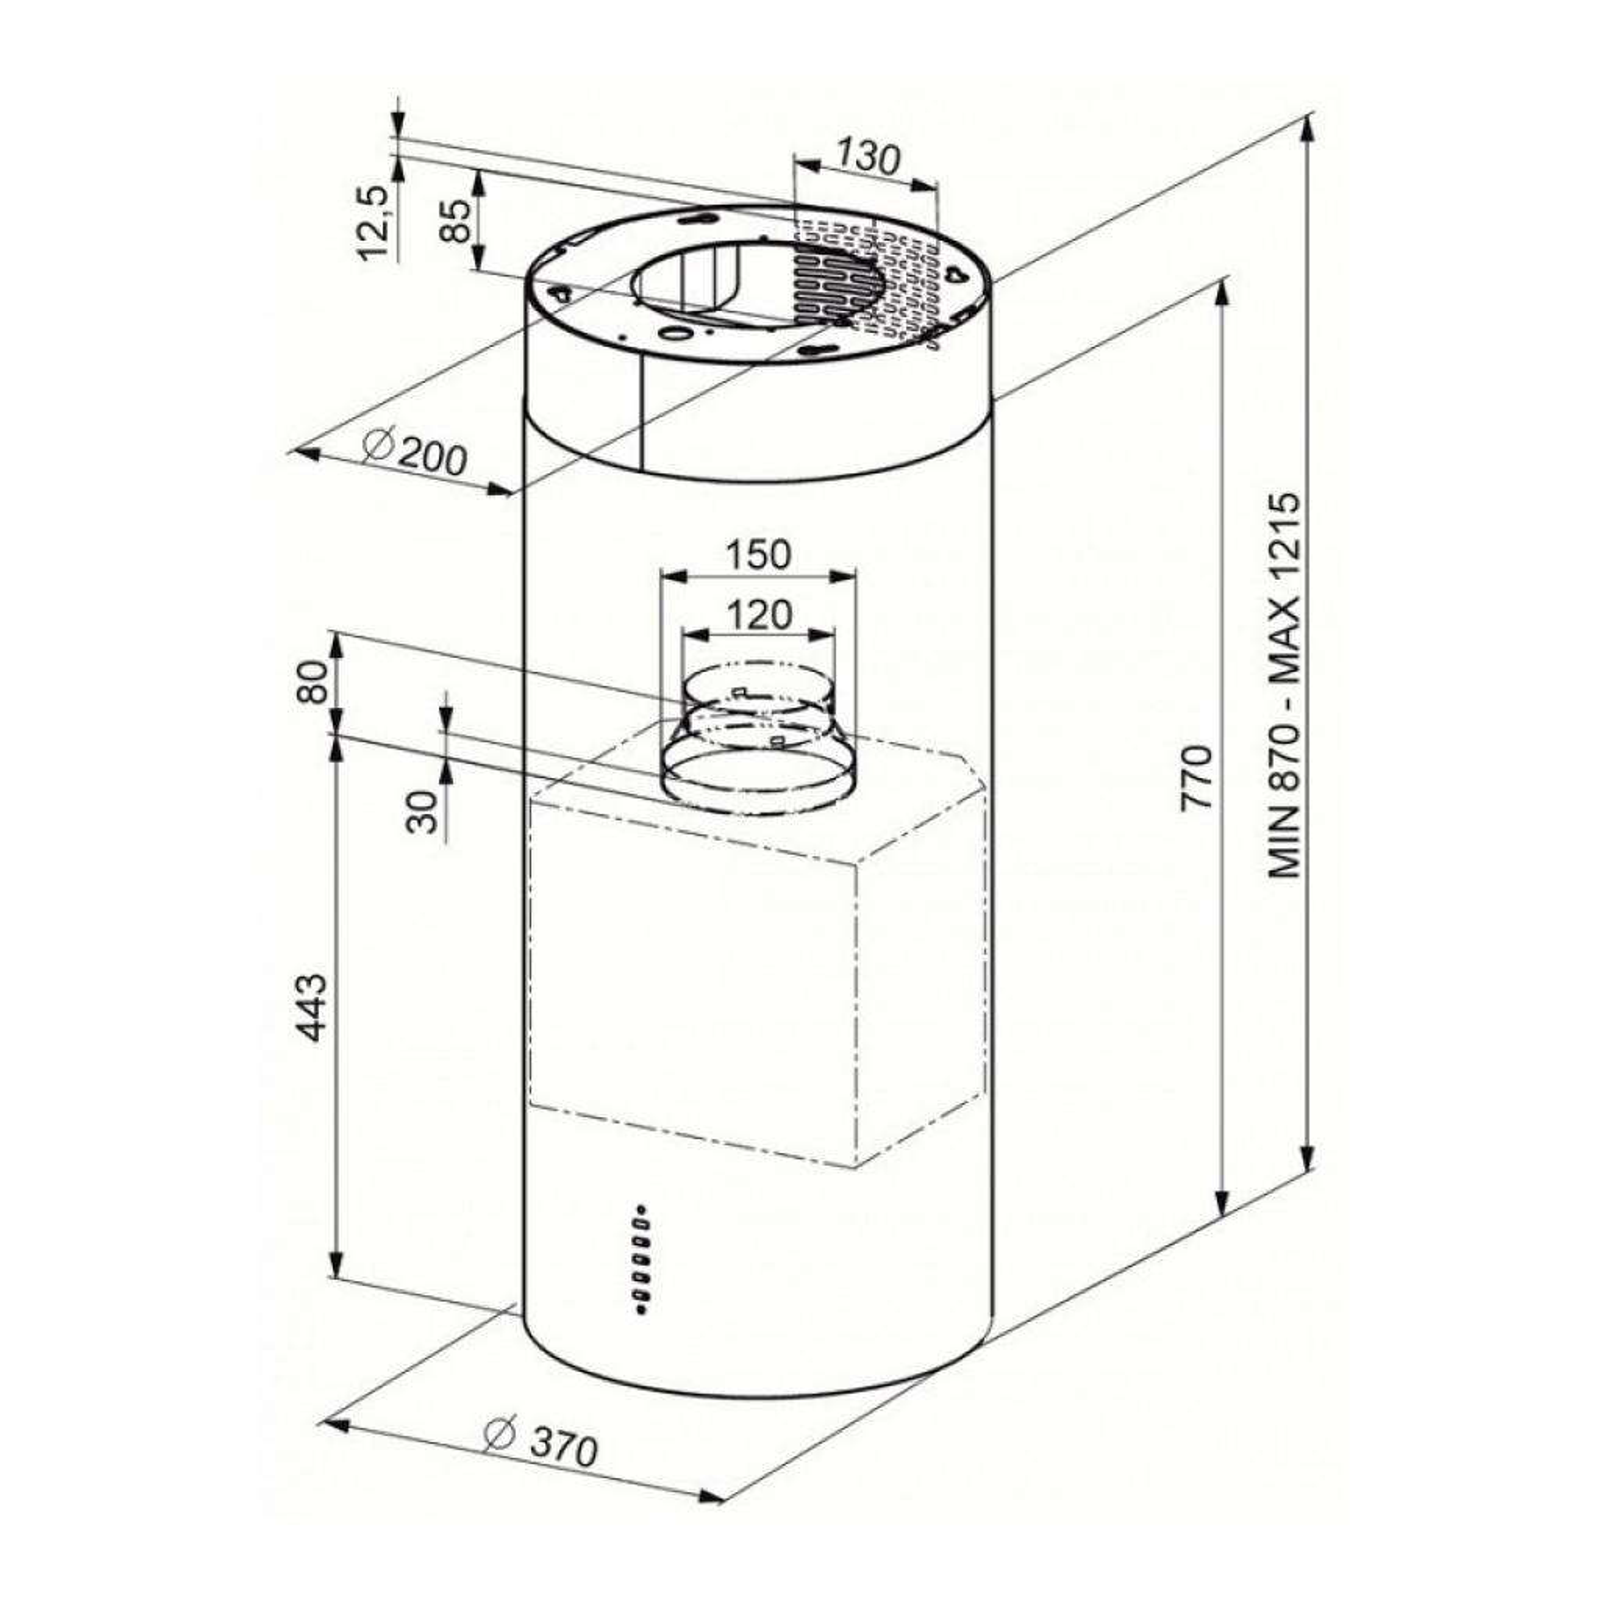 Вытяжка кухонная FABER ISOLA Gloss EG8 ELN WH A37 изображение 2